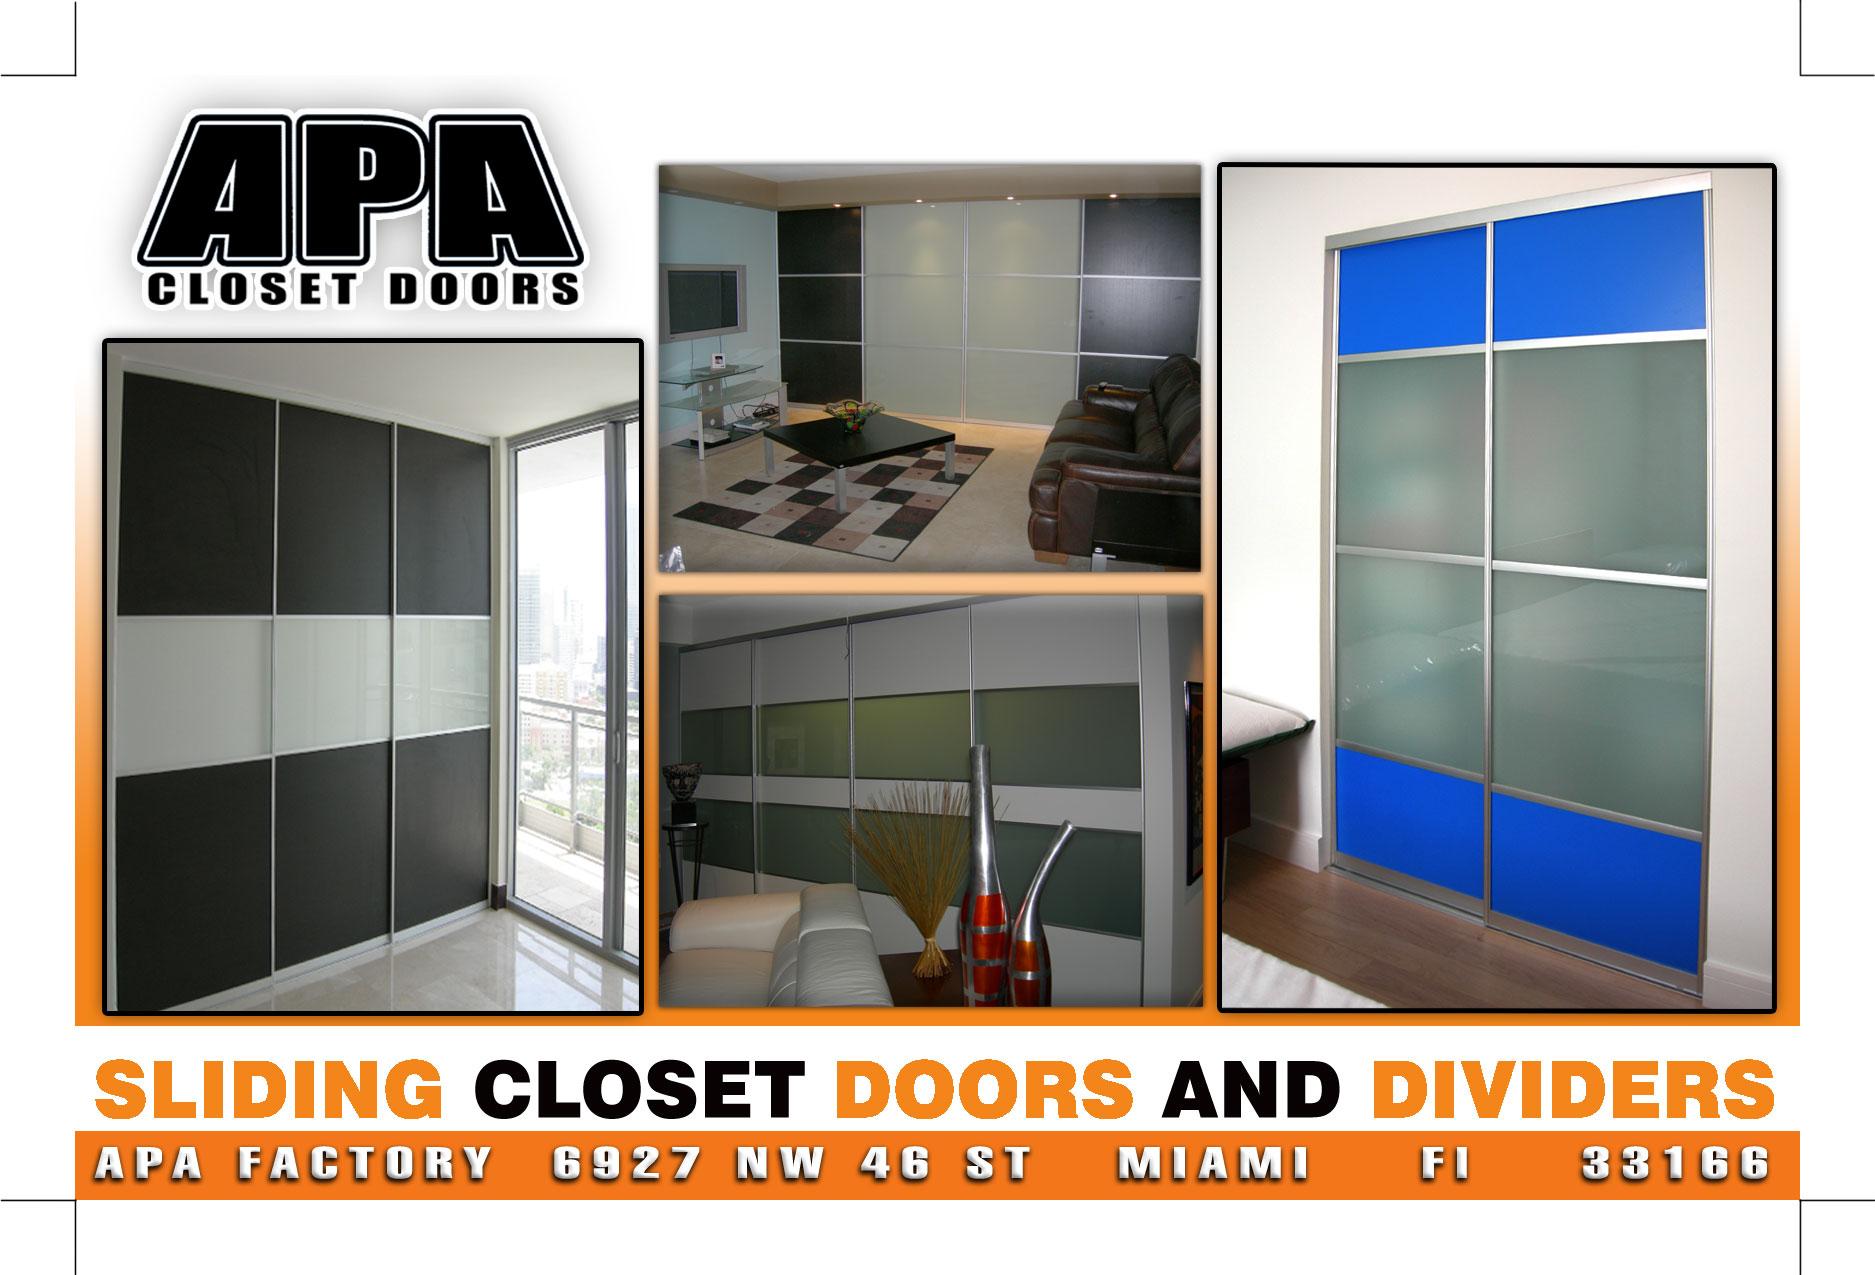 YOSVANY TEIJEIRO APA Closet Doors Graphic Design Catalog Furniture Miami  2008 12